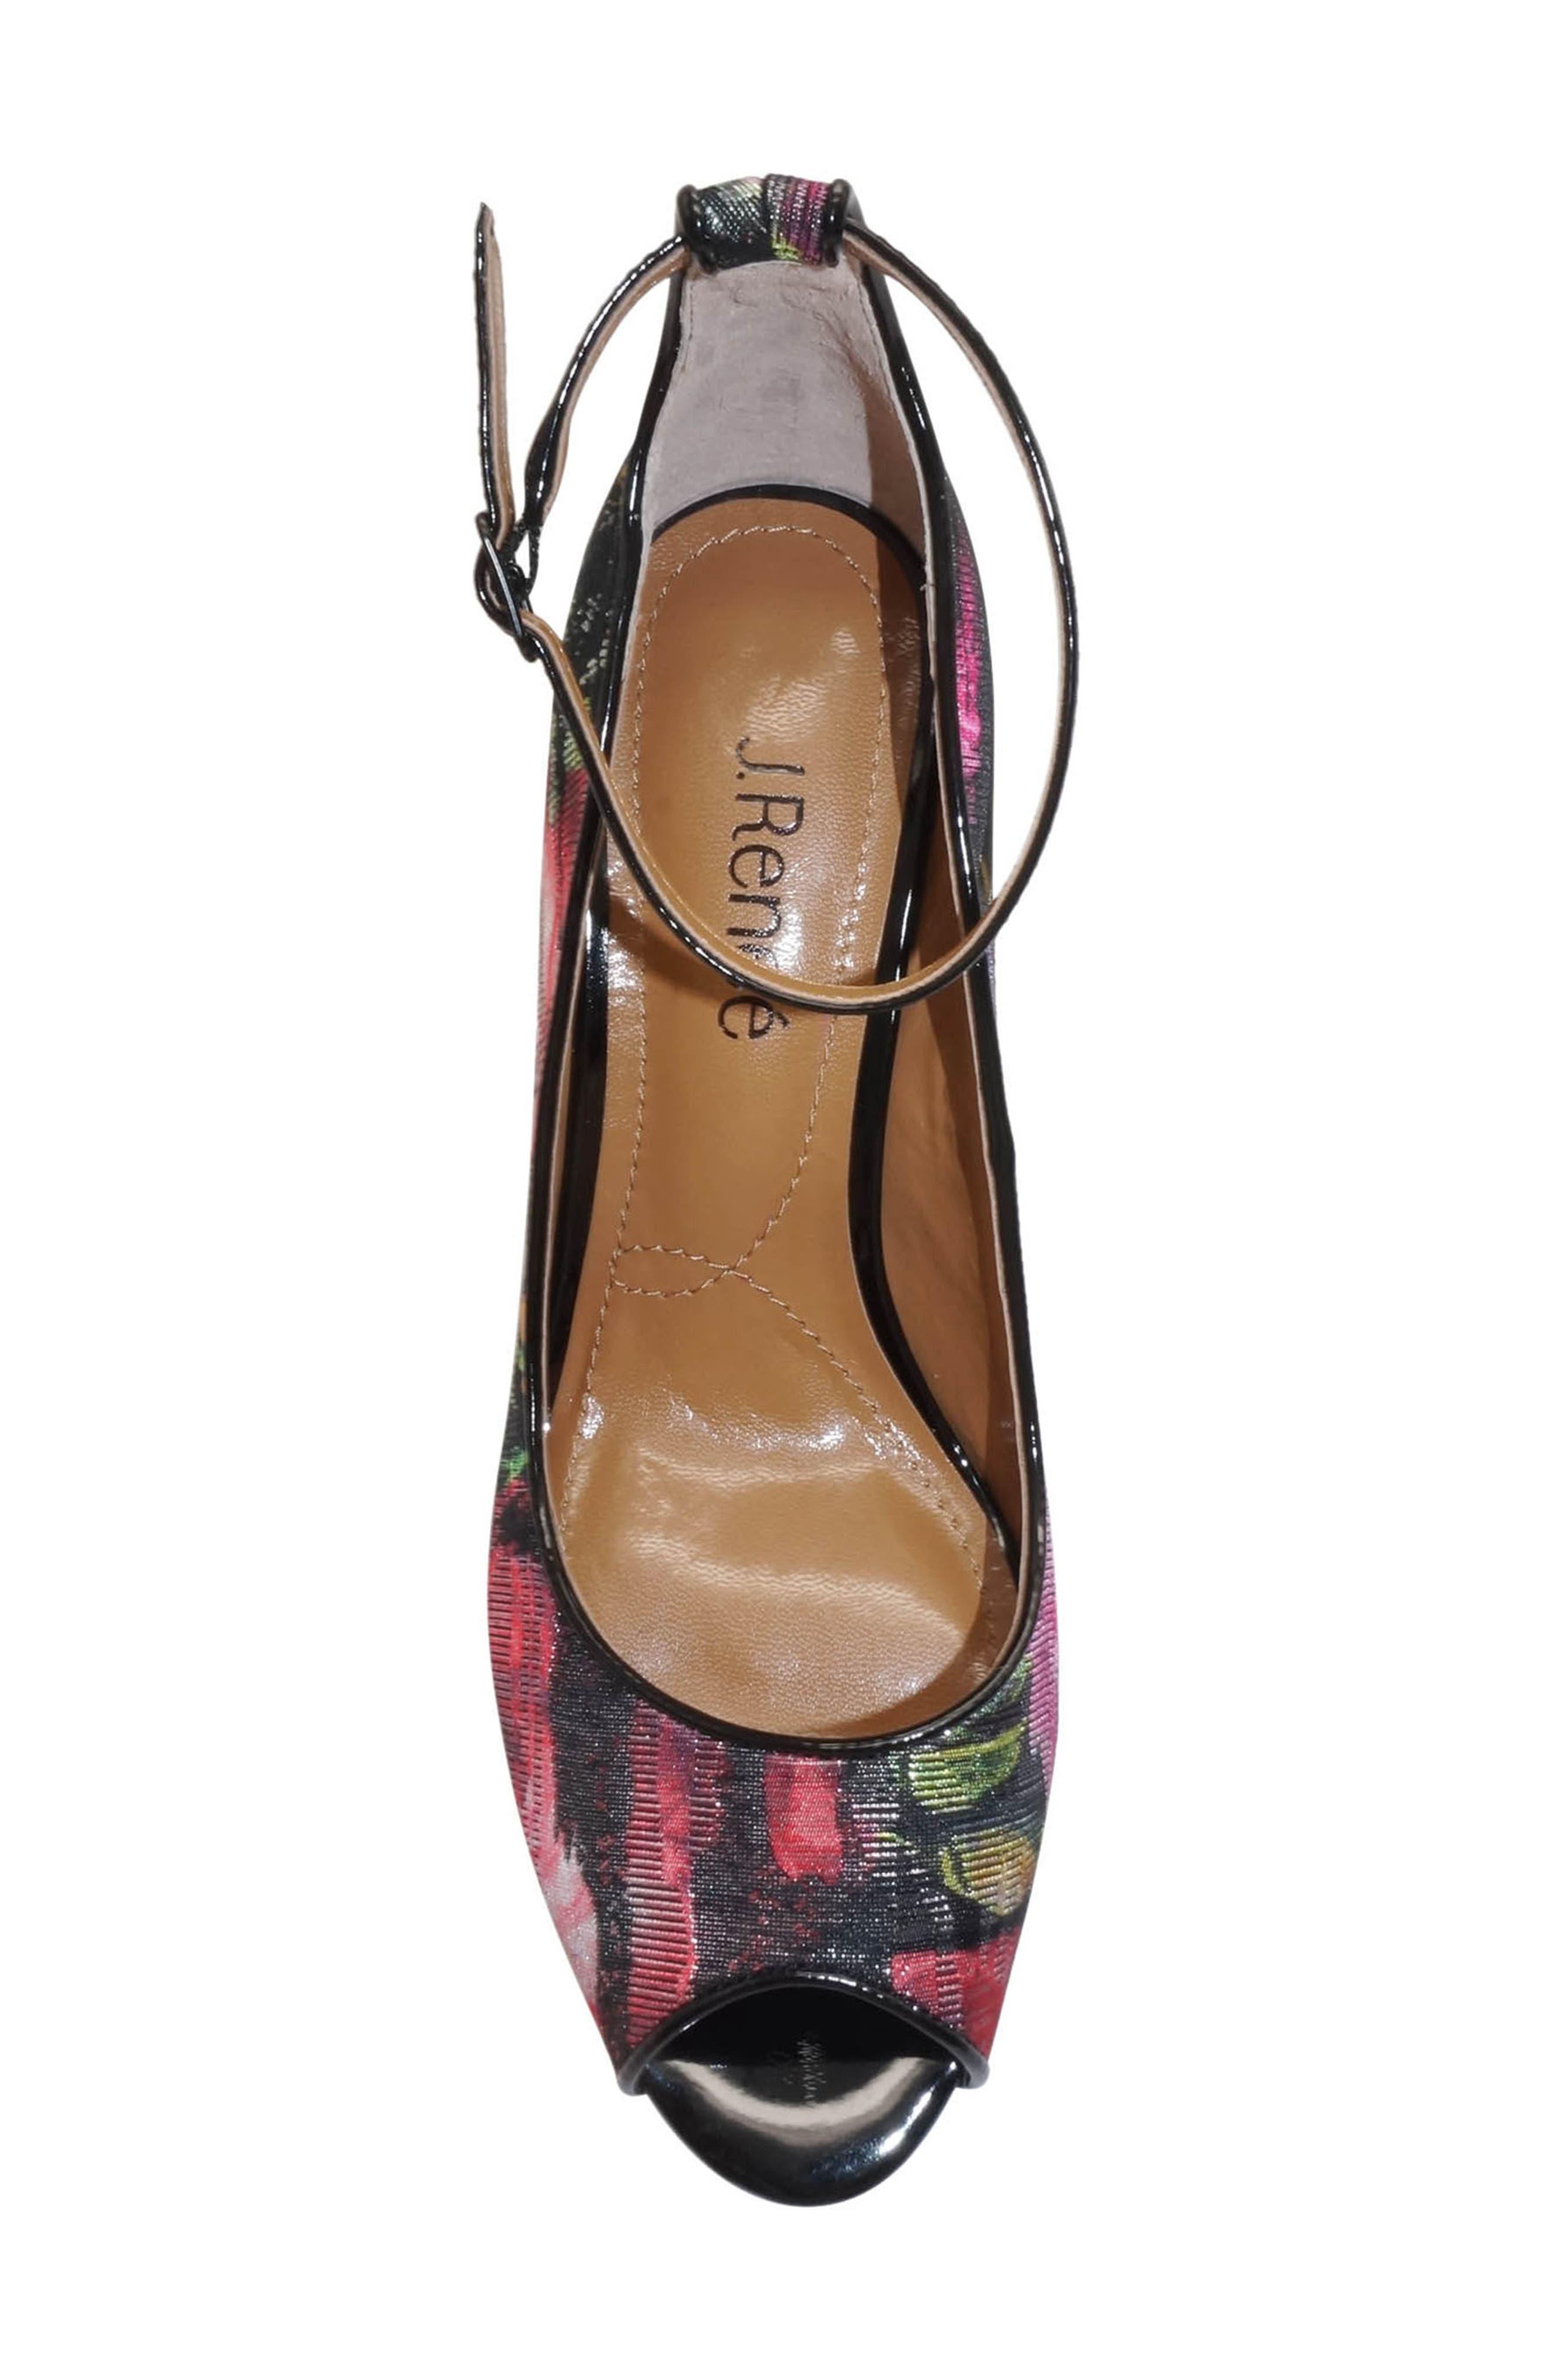 Raspalli Ankle Strap Peep Toe Pump,                             Alternate thumbnail 5, color,                             Red/ Black Multi